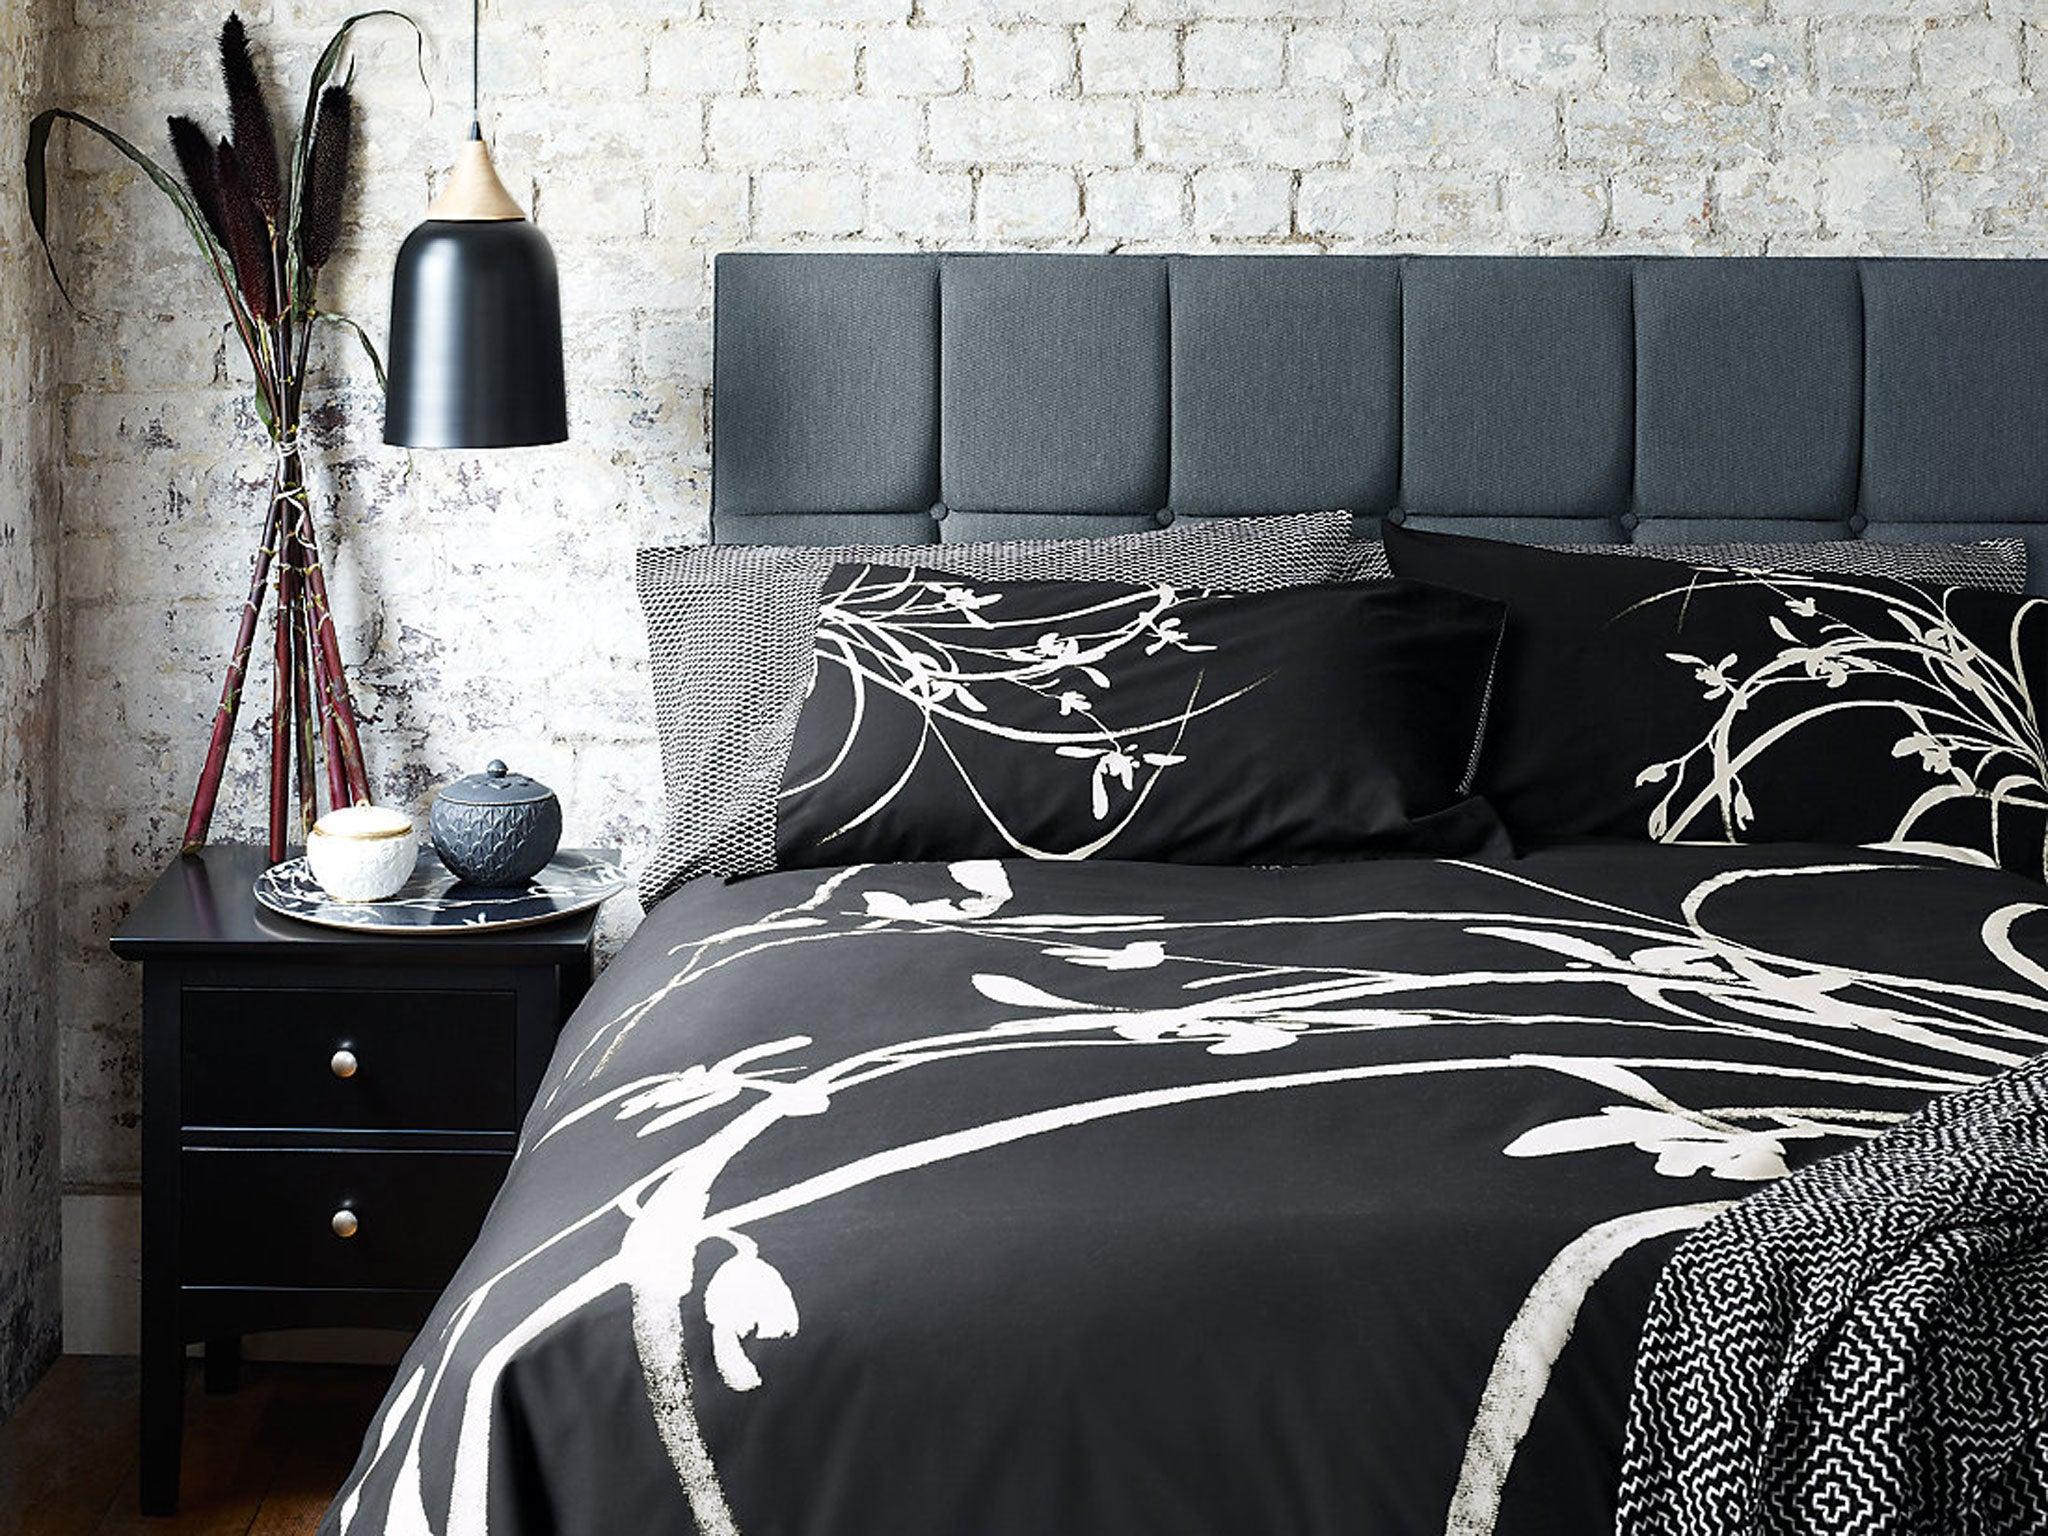 Marks And Spencer Hastings Bedroom Furniture 10 Best Bedside Tables The Independent